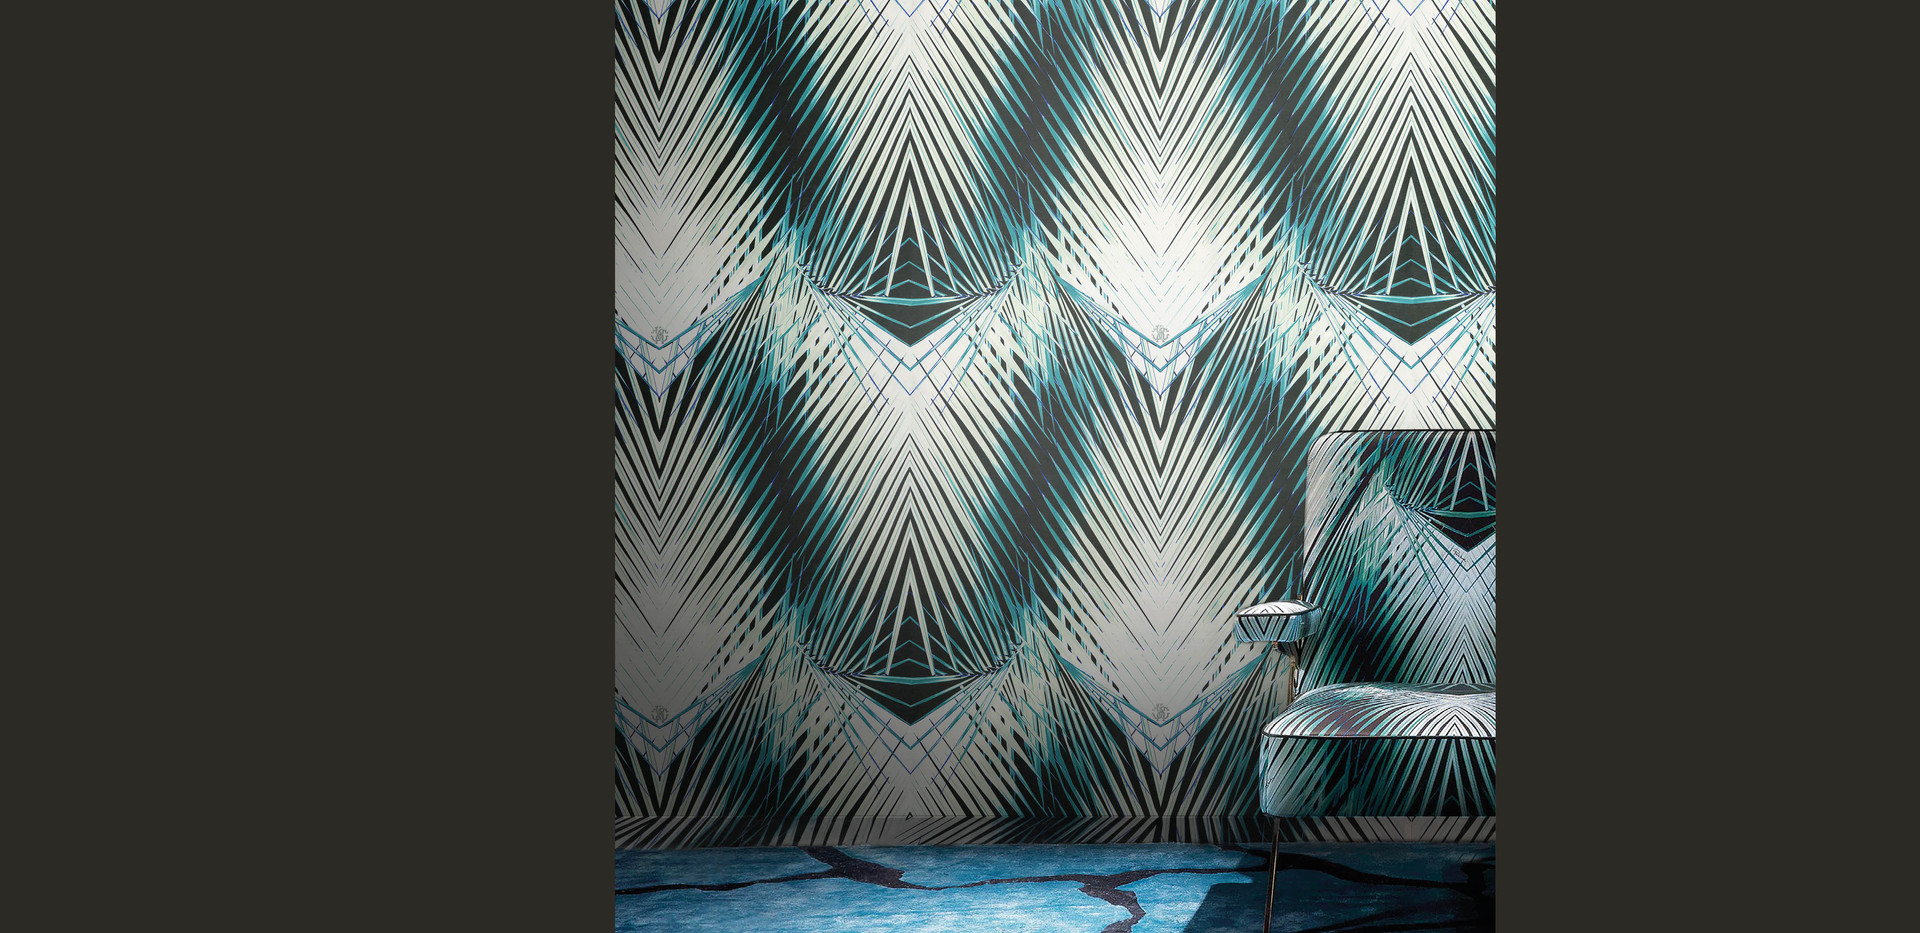 LifeNcolors-best-wallpaper-branded-luxury-pattern-seablue